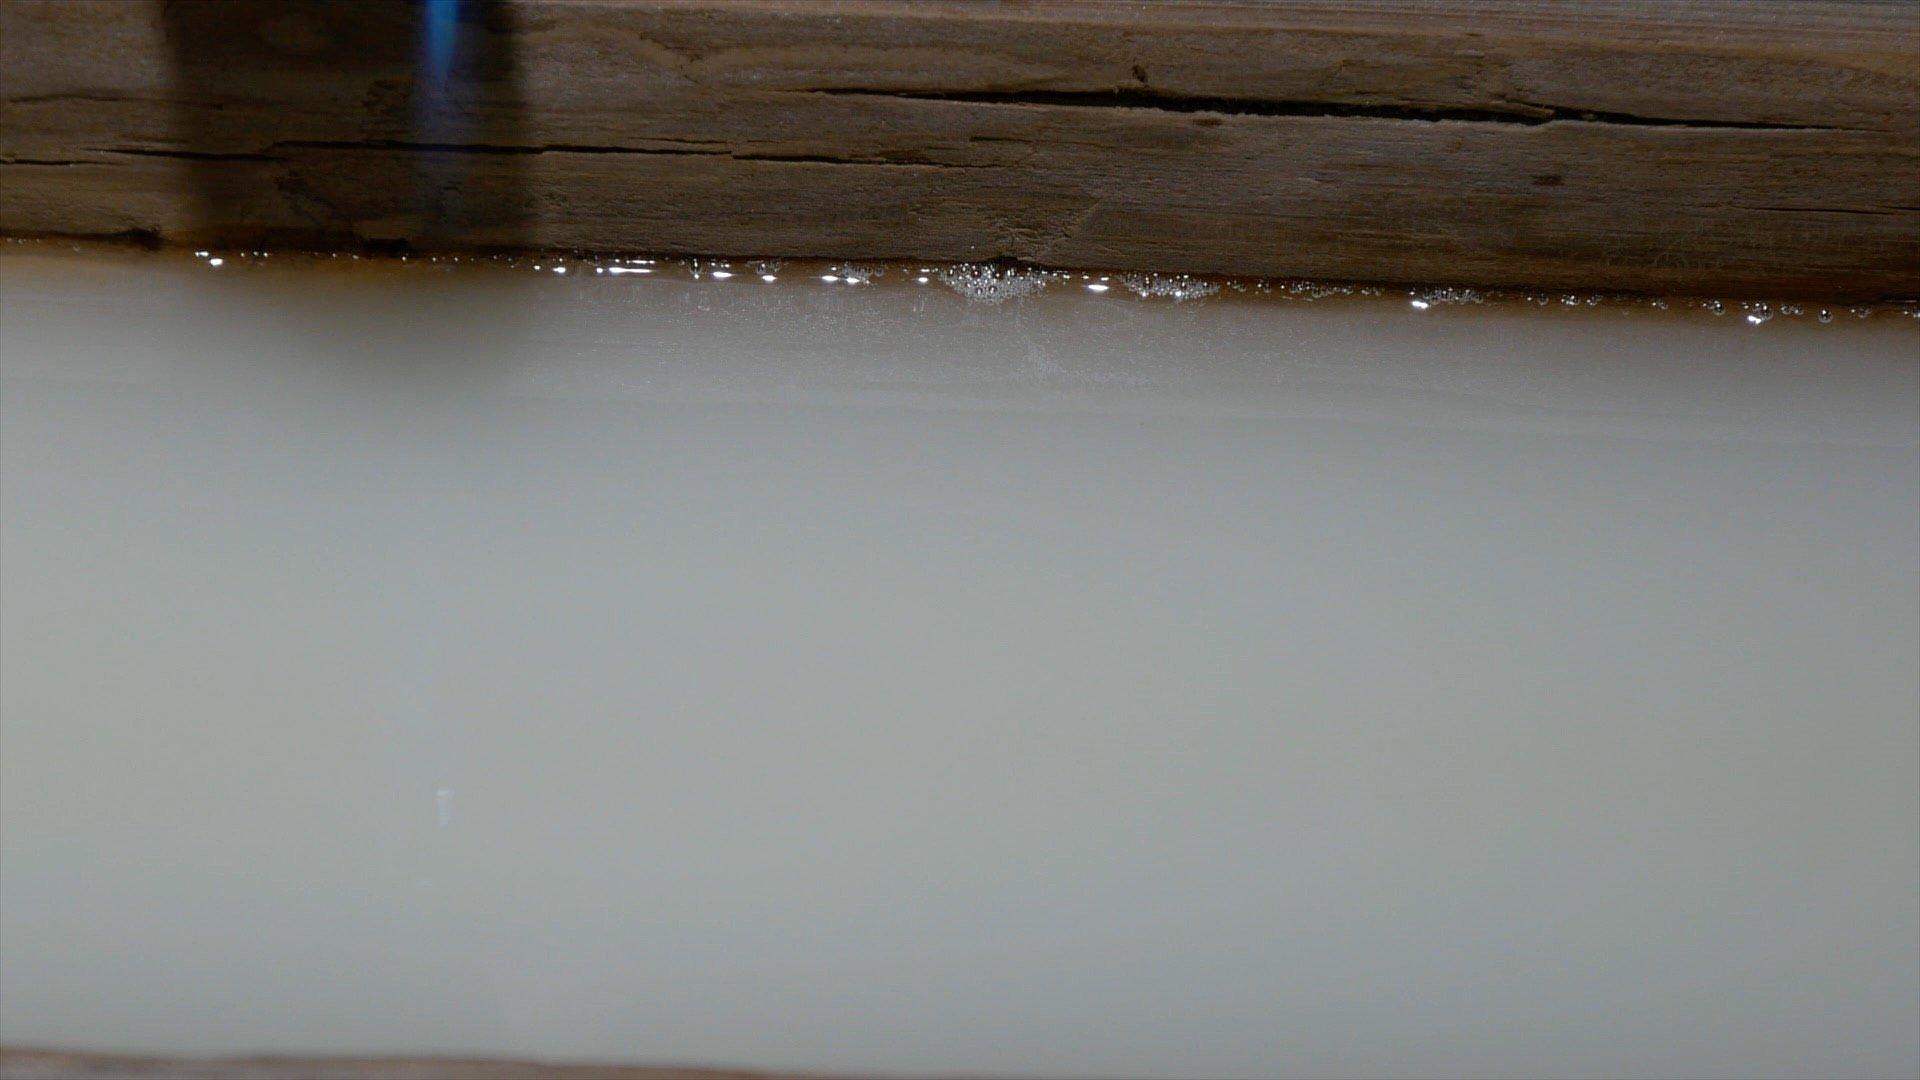 epoxy-resin-river-table-glowpowder_20171016_31